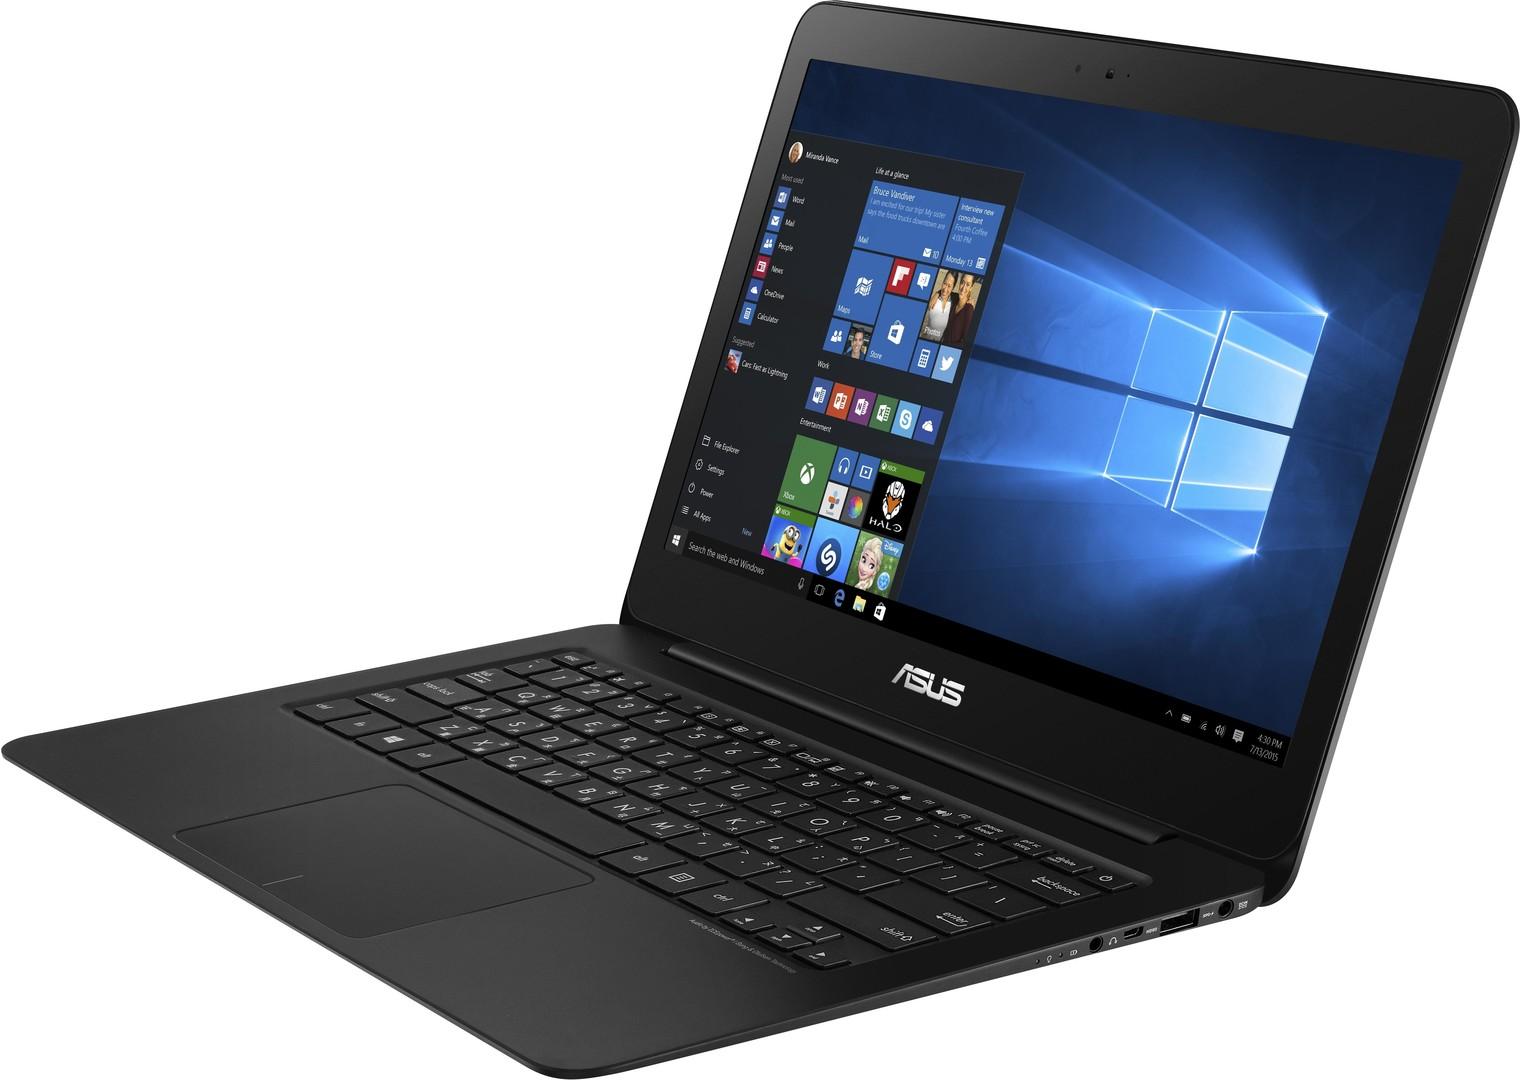 ASUS UX305CA 13.3T/6Y54/256SSD/8G/W10 černý